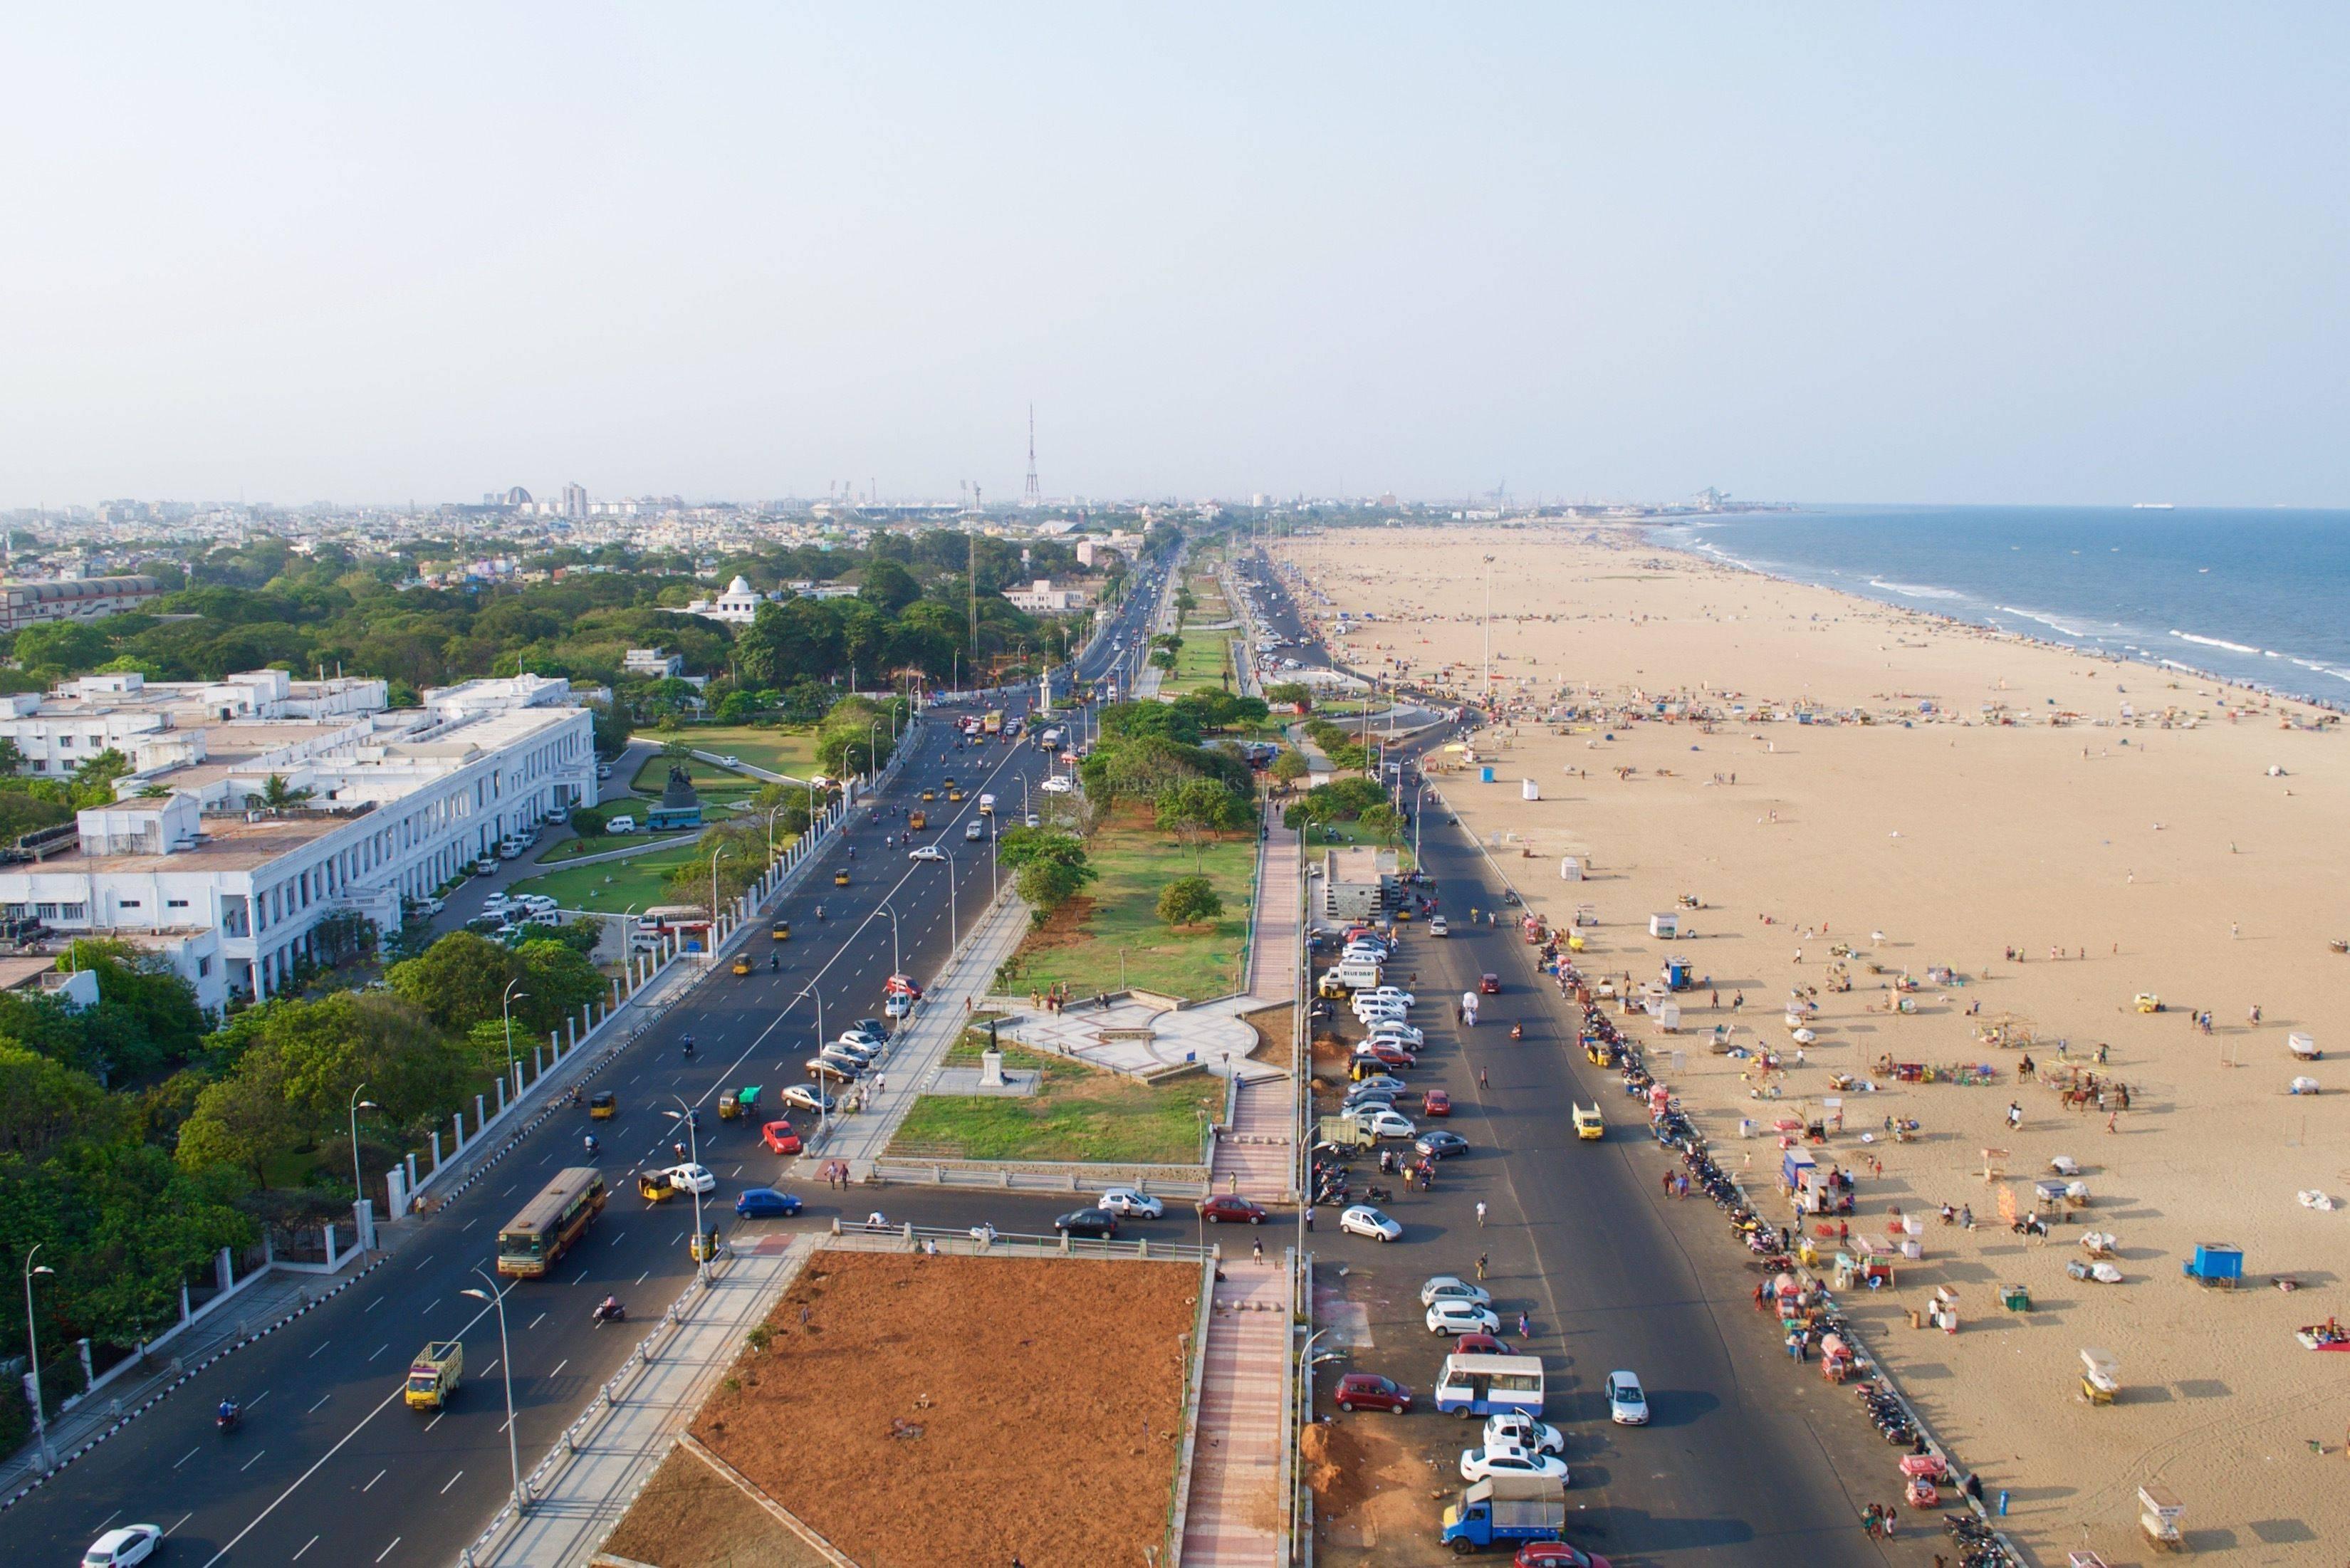 Land sales in Chennai's prime areas dip